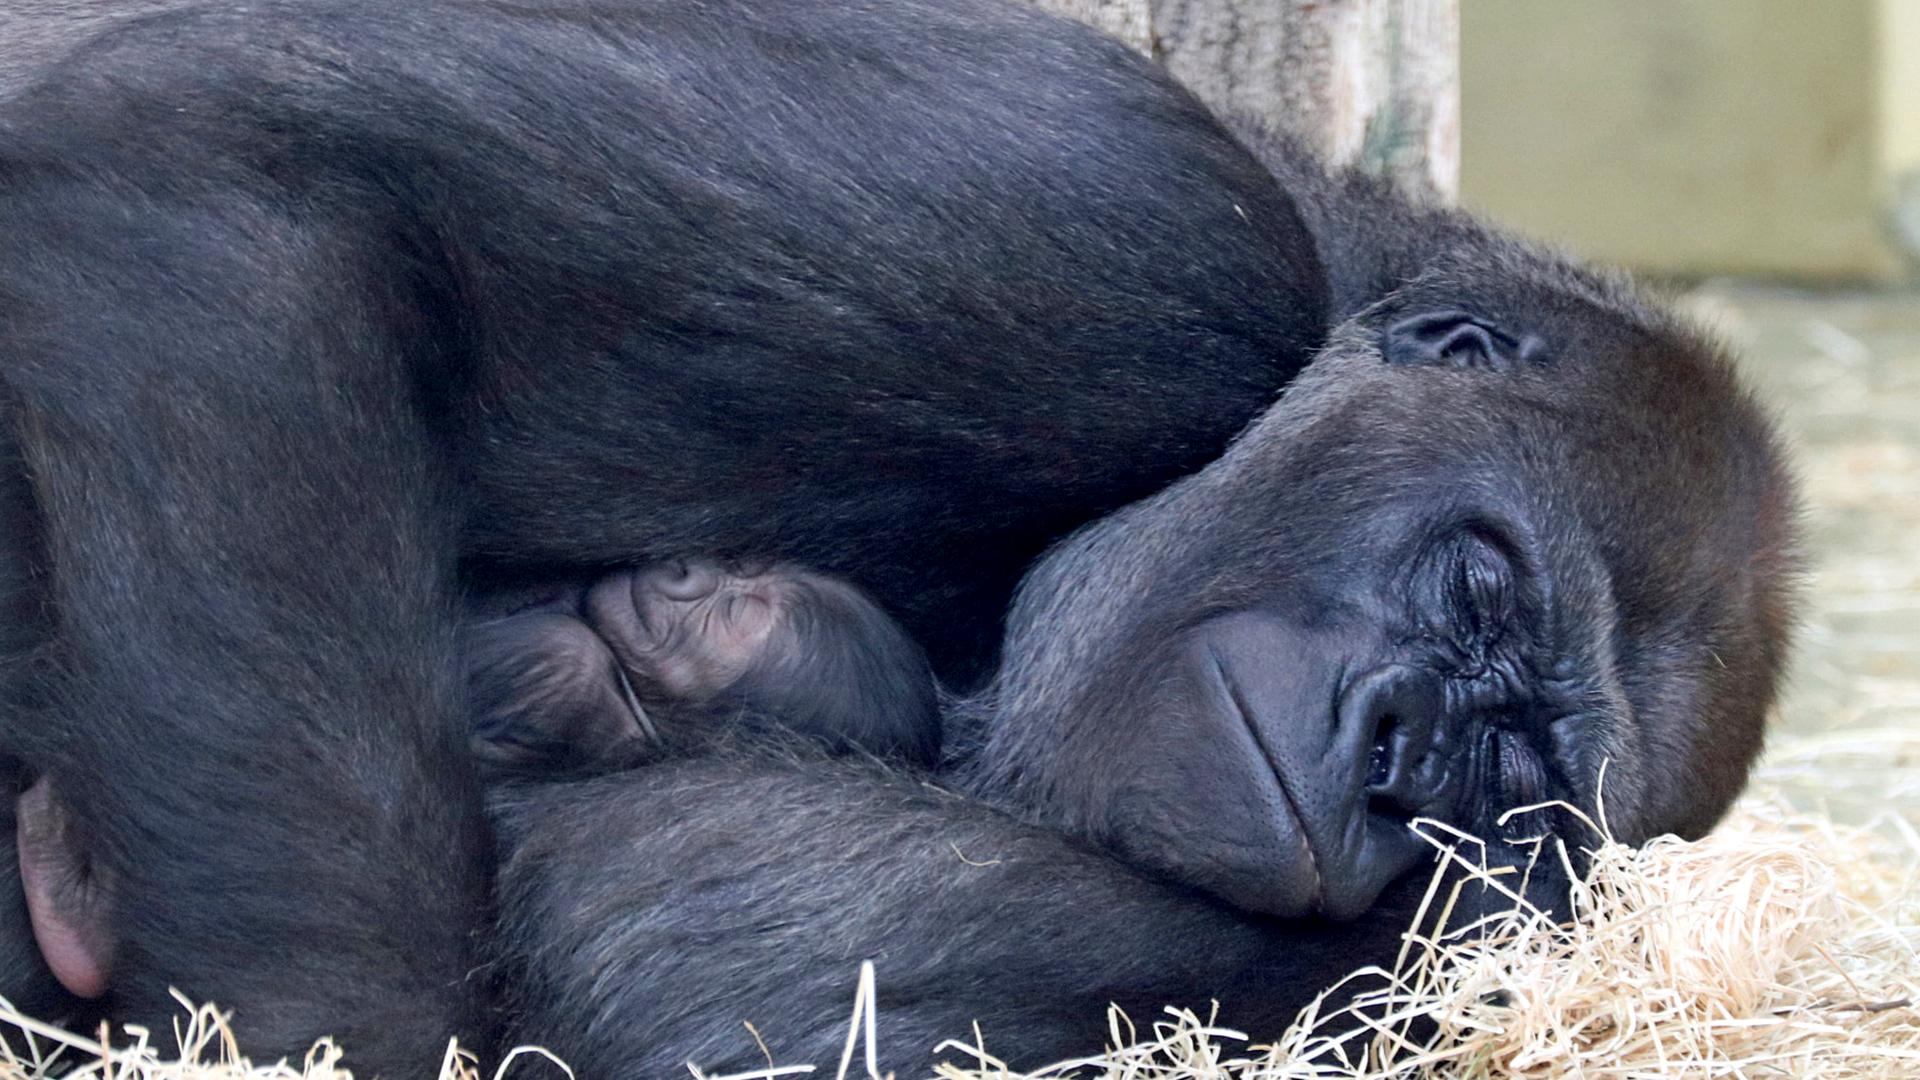 VIDEO: Berlin Zoo Seeks Public's Help In Naming Two-Week-Old Gorilla Cub